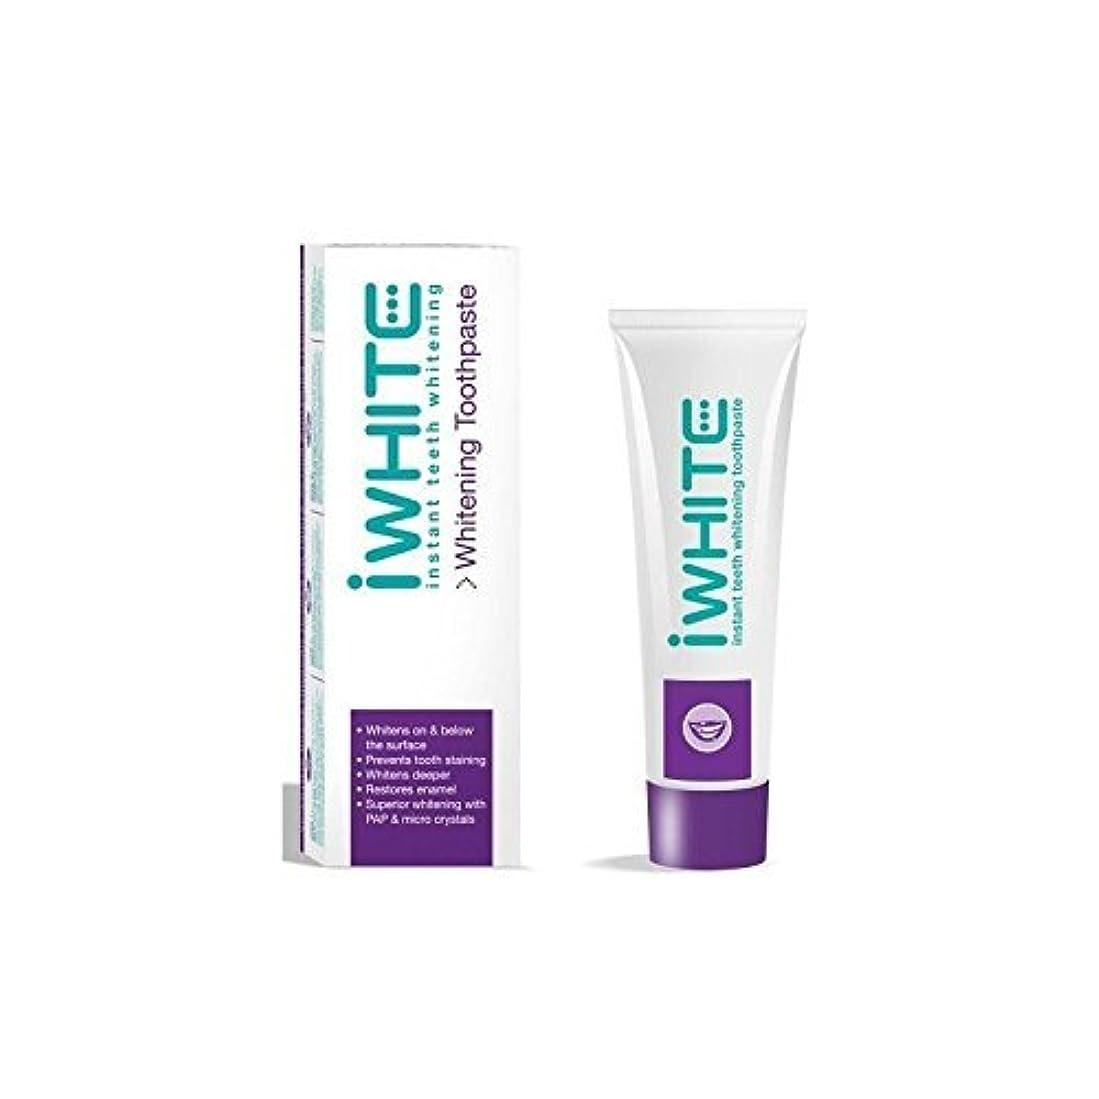 iWhite Instant Teeth Whitening Toothpaste (75ml) by iWhite